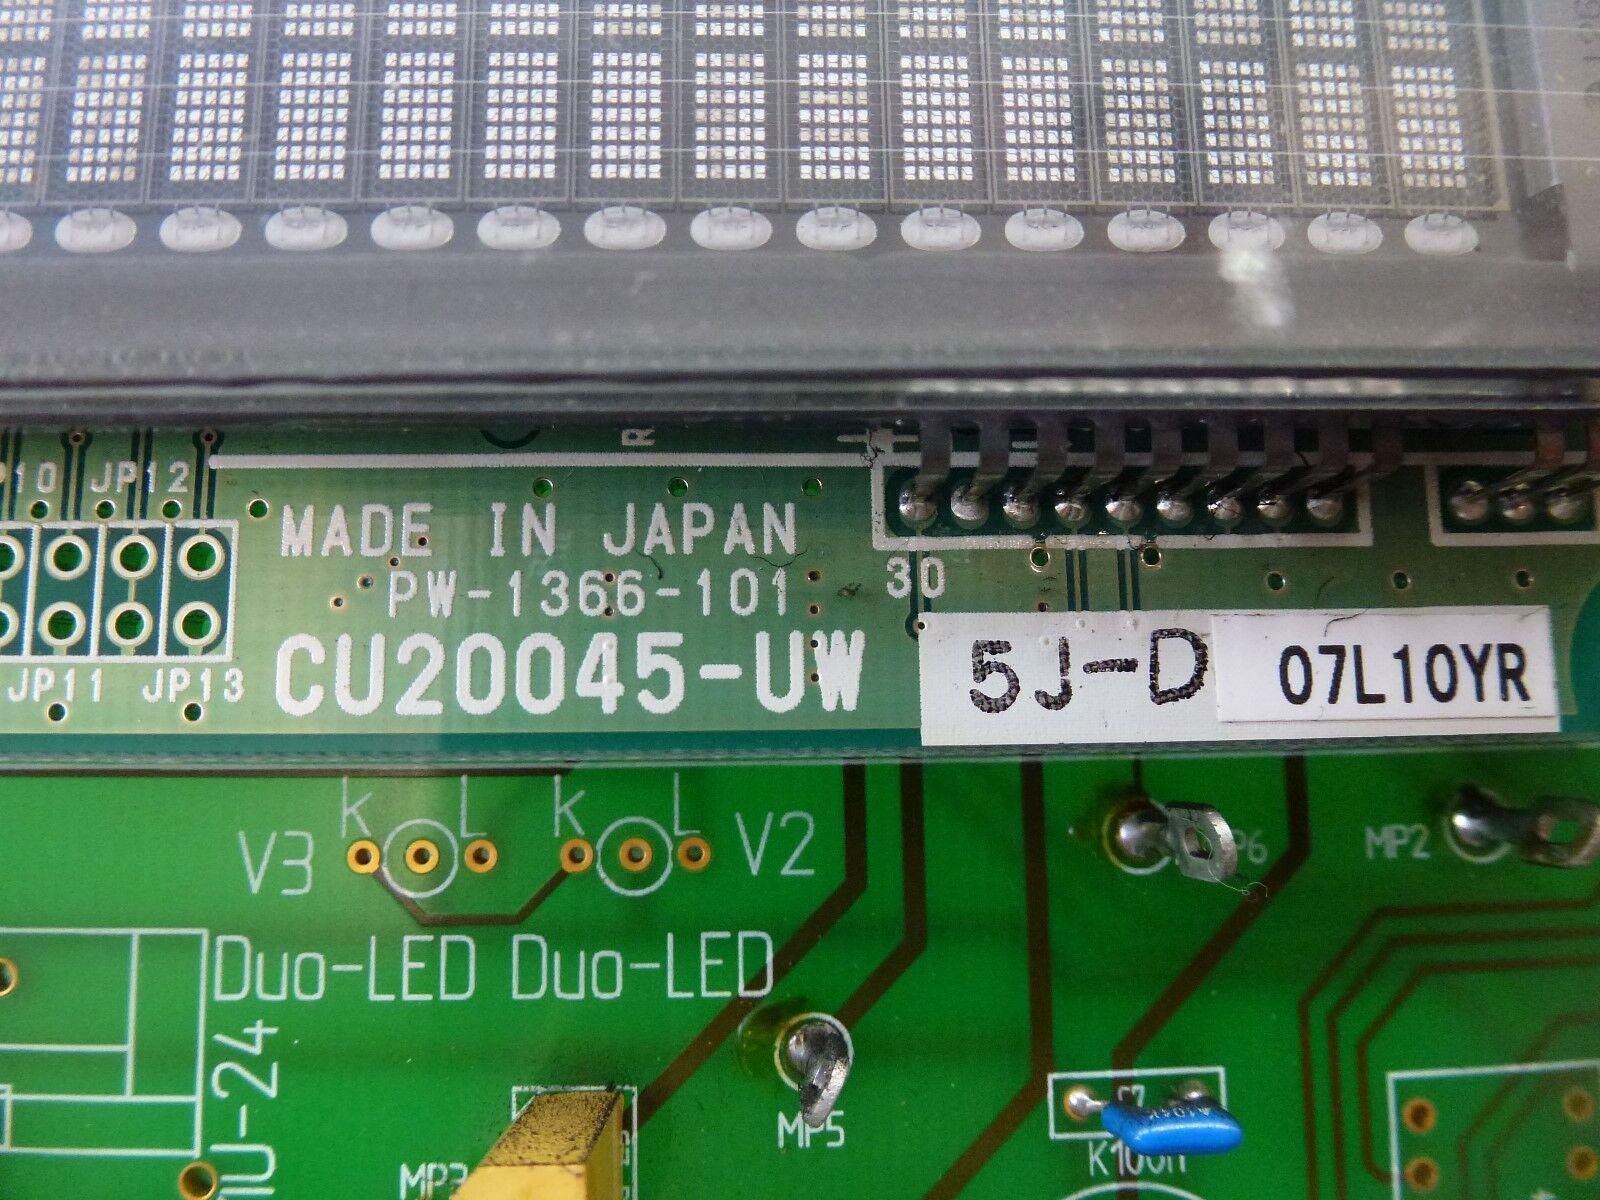 Itron 5J-D, CU20045-UW 5J-D, Itron Iton Noritake Affichage + HE288-1 Terminal de Commande 85bdbd